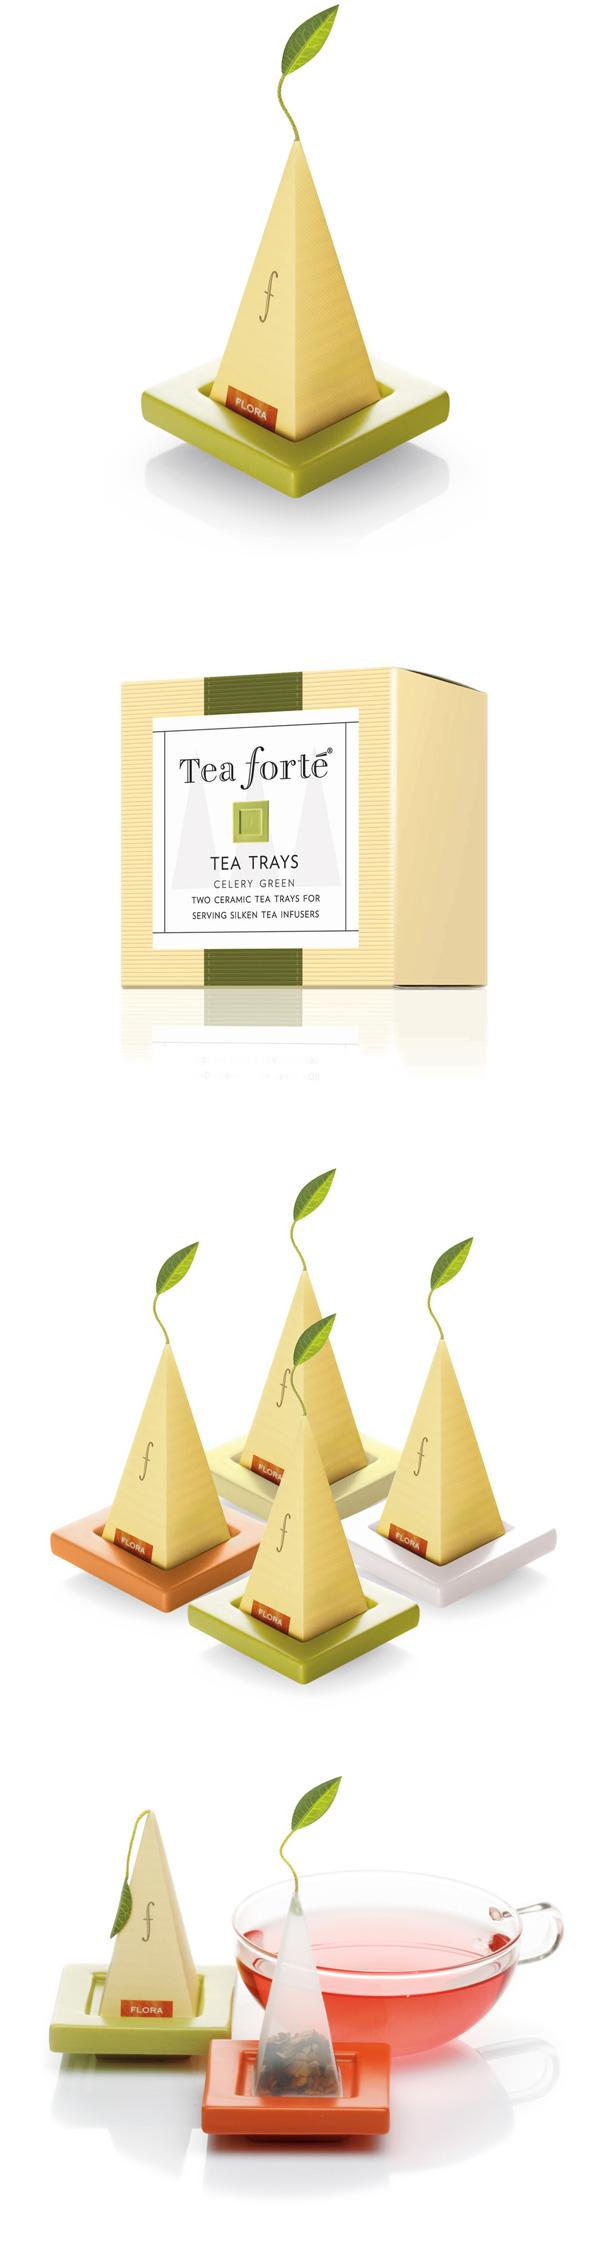 Tea Forte 2入陶瓷方型茶托(白瓷)